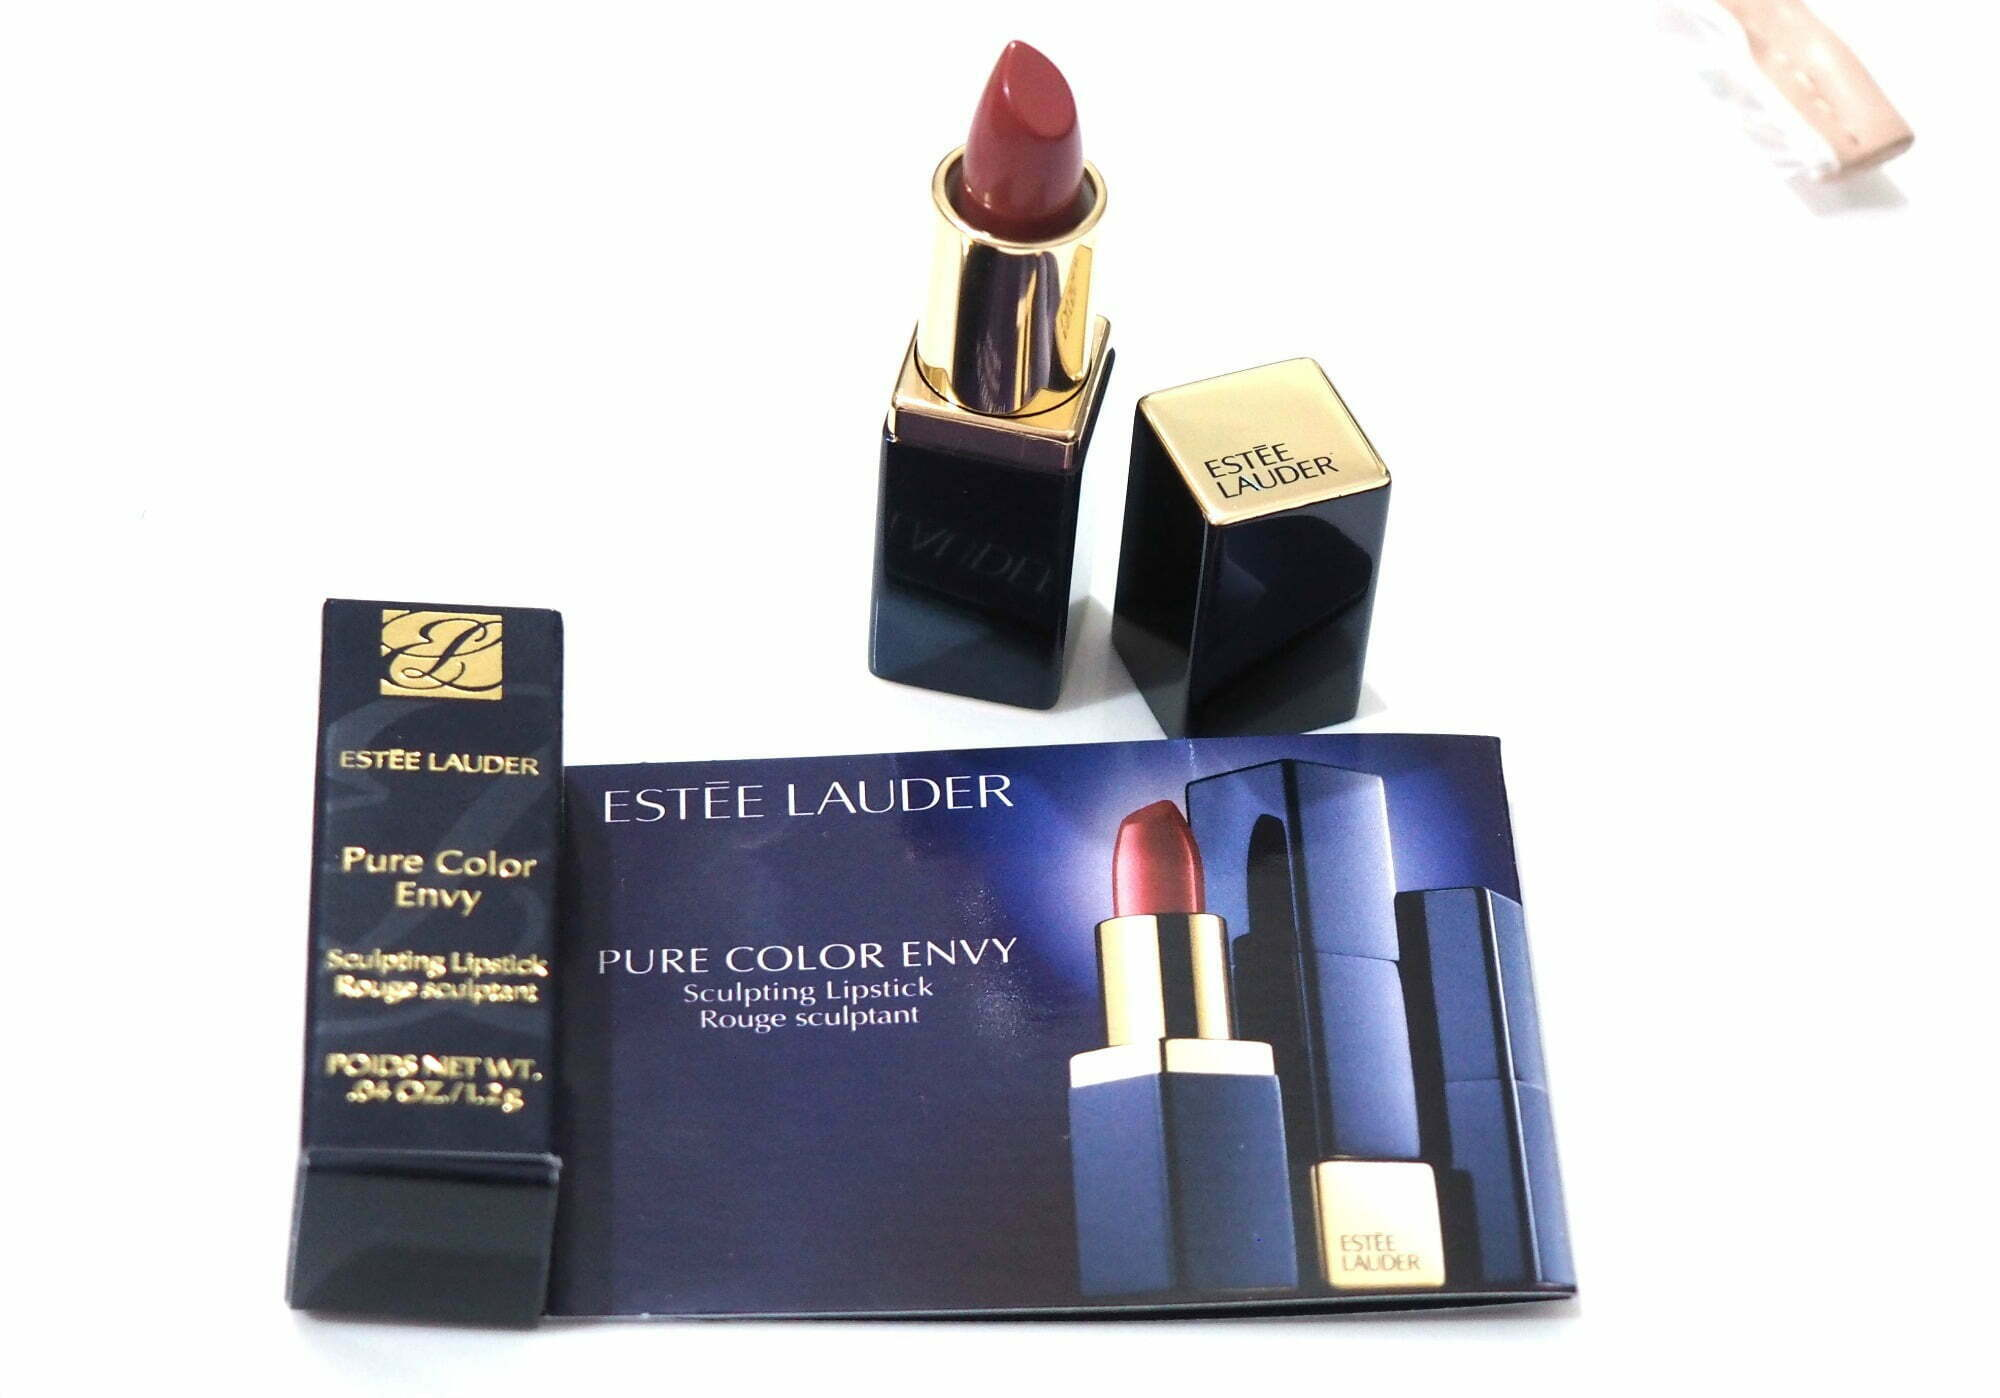 Feelunique Beauty Kit August 2020